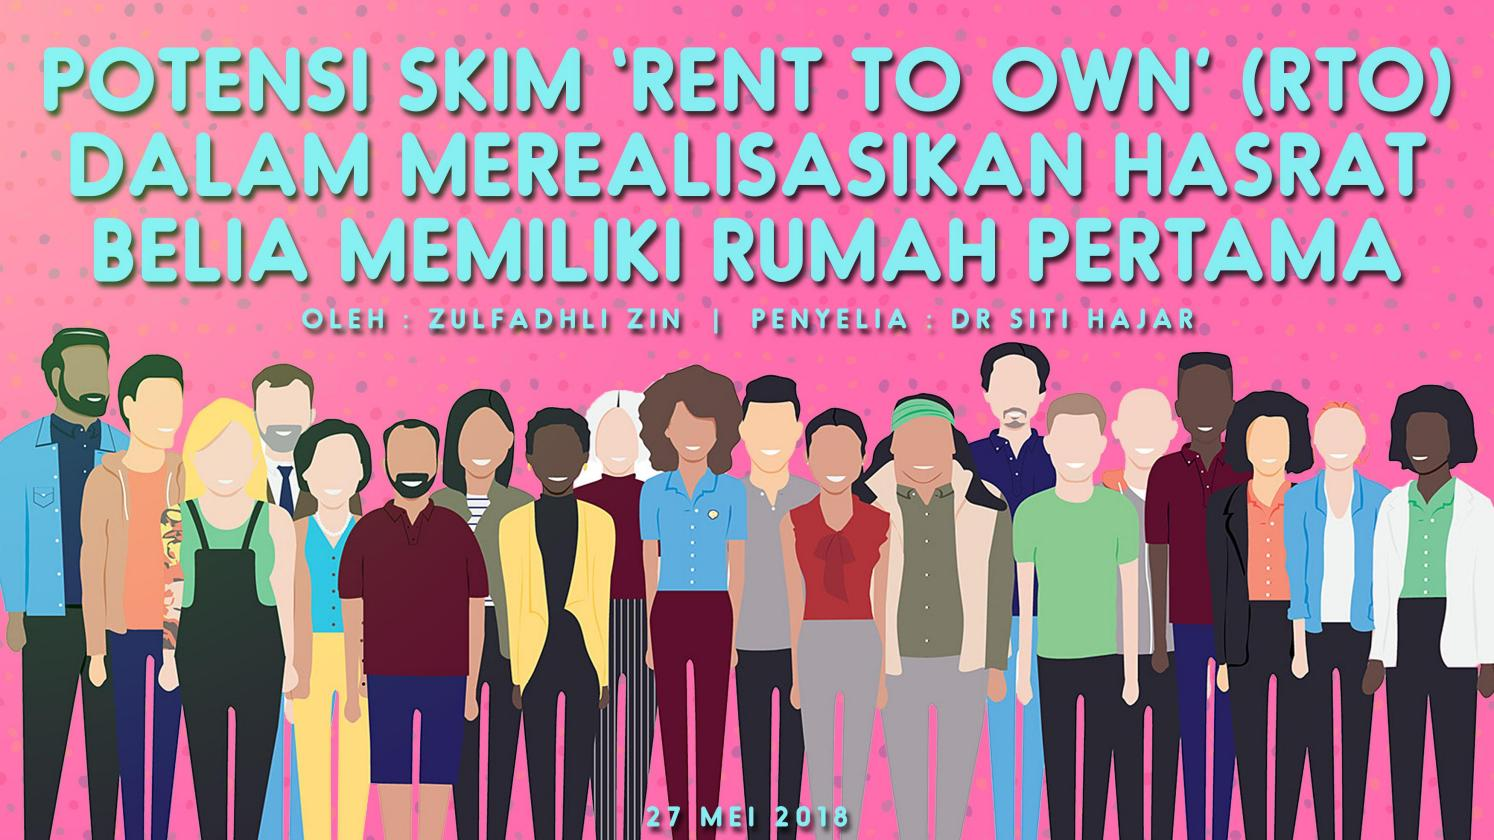 Potensi Skim Rent To Own Rto Dalam Merealisasikan Hasrat Belia Memiliki Rumah Pertama By Zulfadhli Zin Issuu